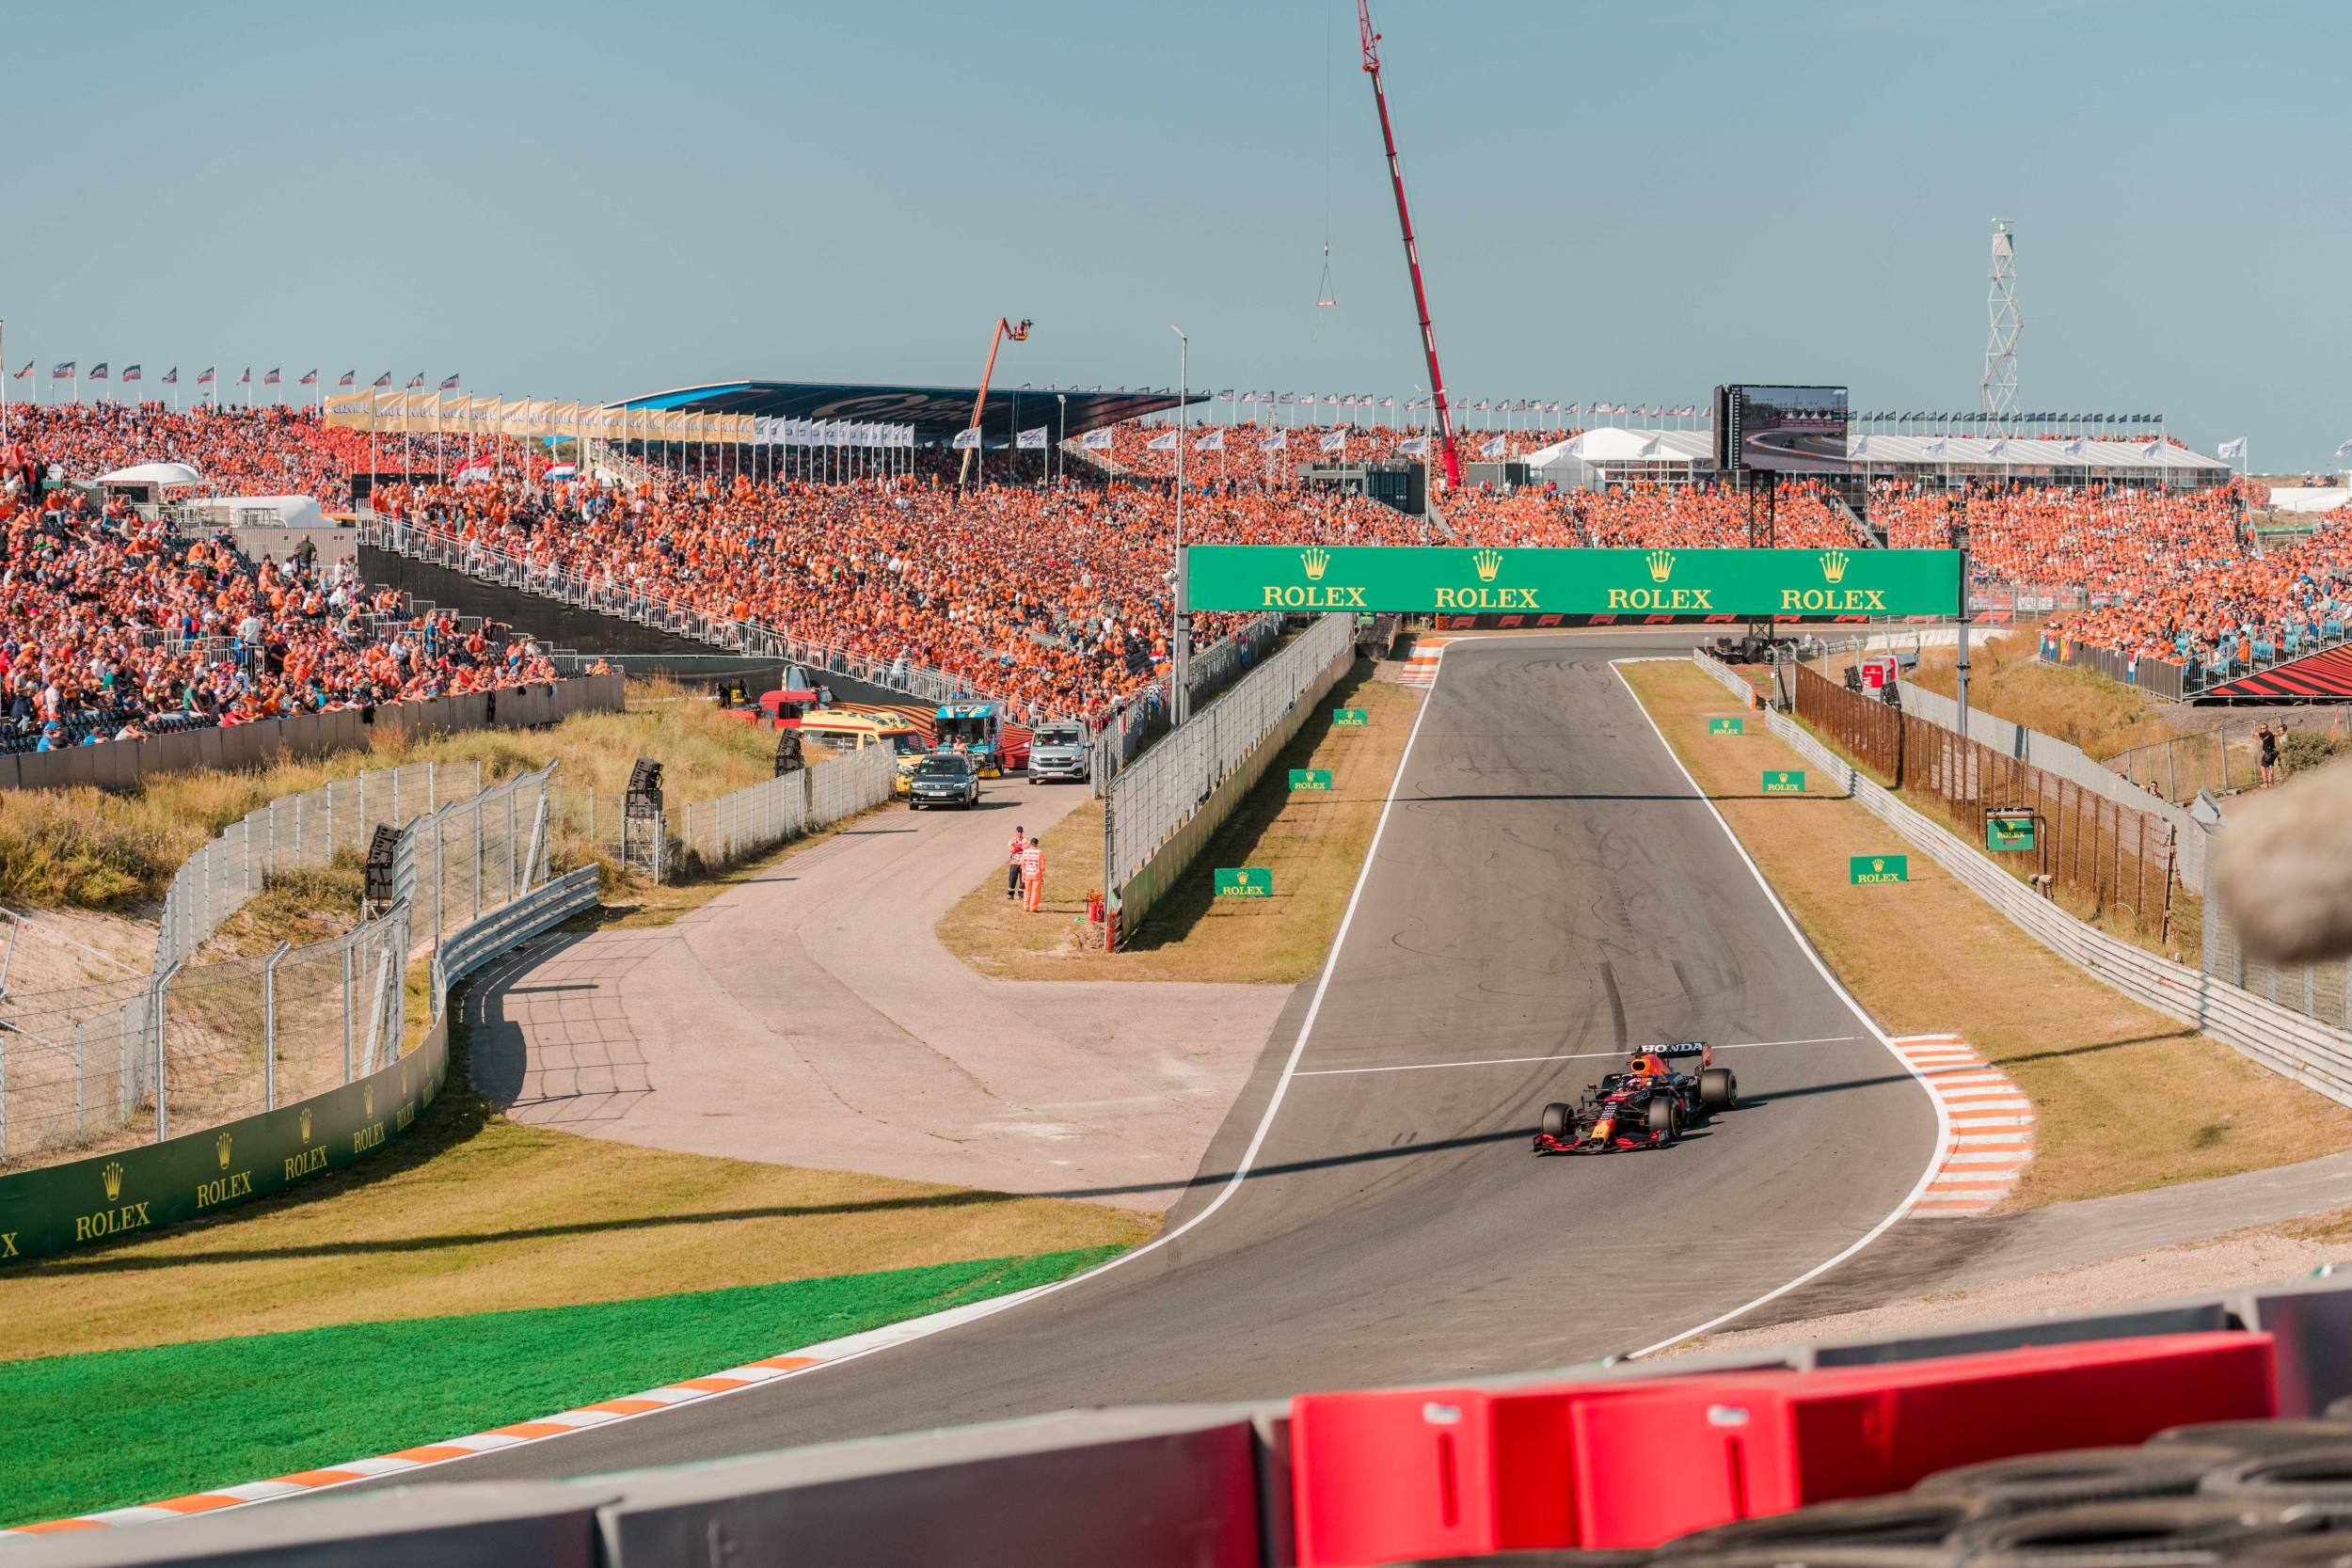 Dutch Grand Prix Zandvoort Max Verstappen heading for turn 13 and 14